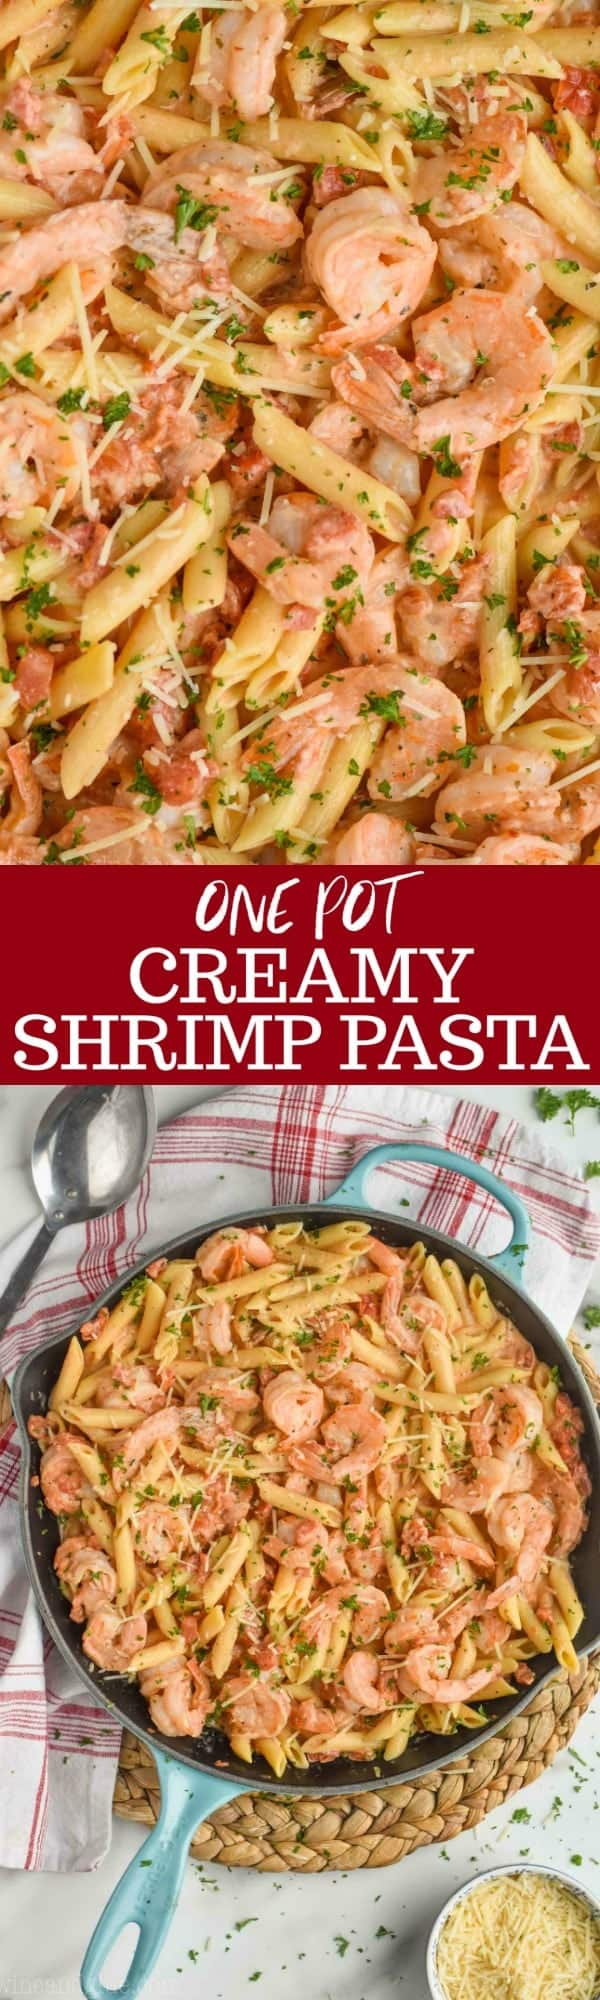 collage of one pot creamy shrimp pasta photos